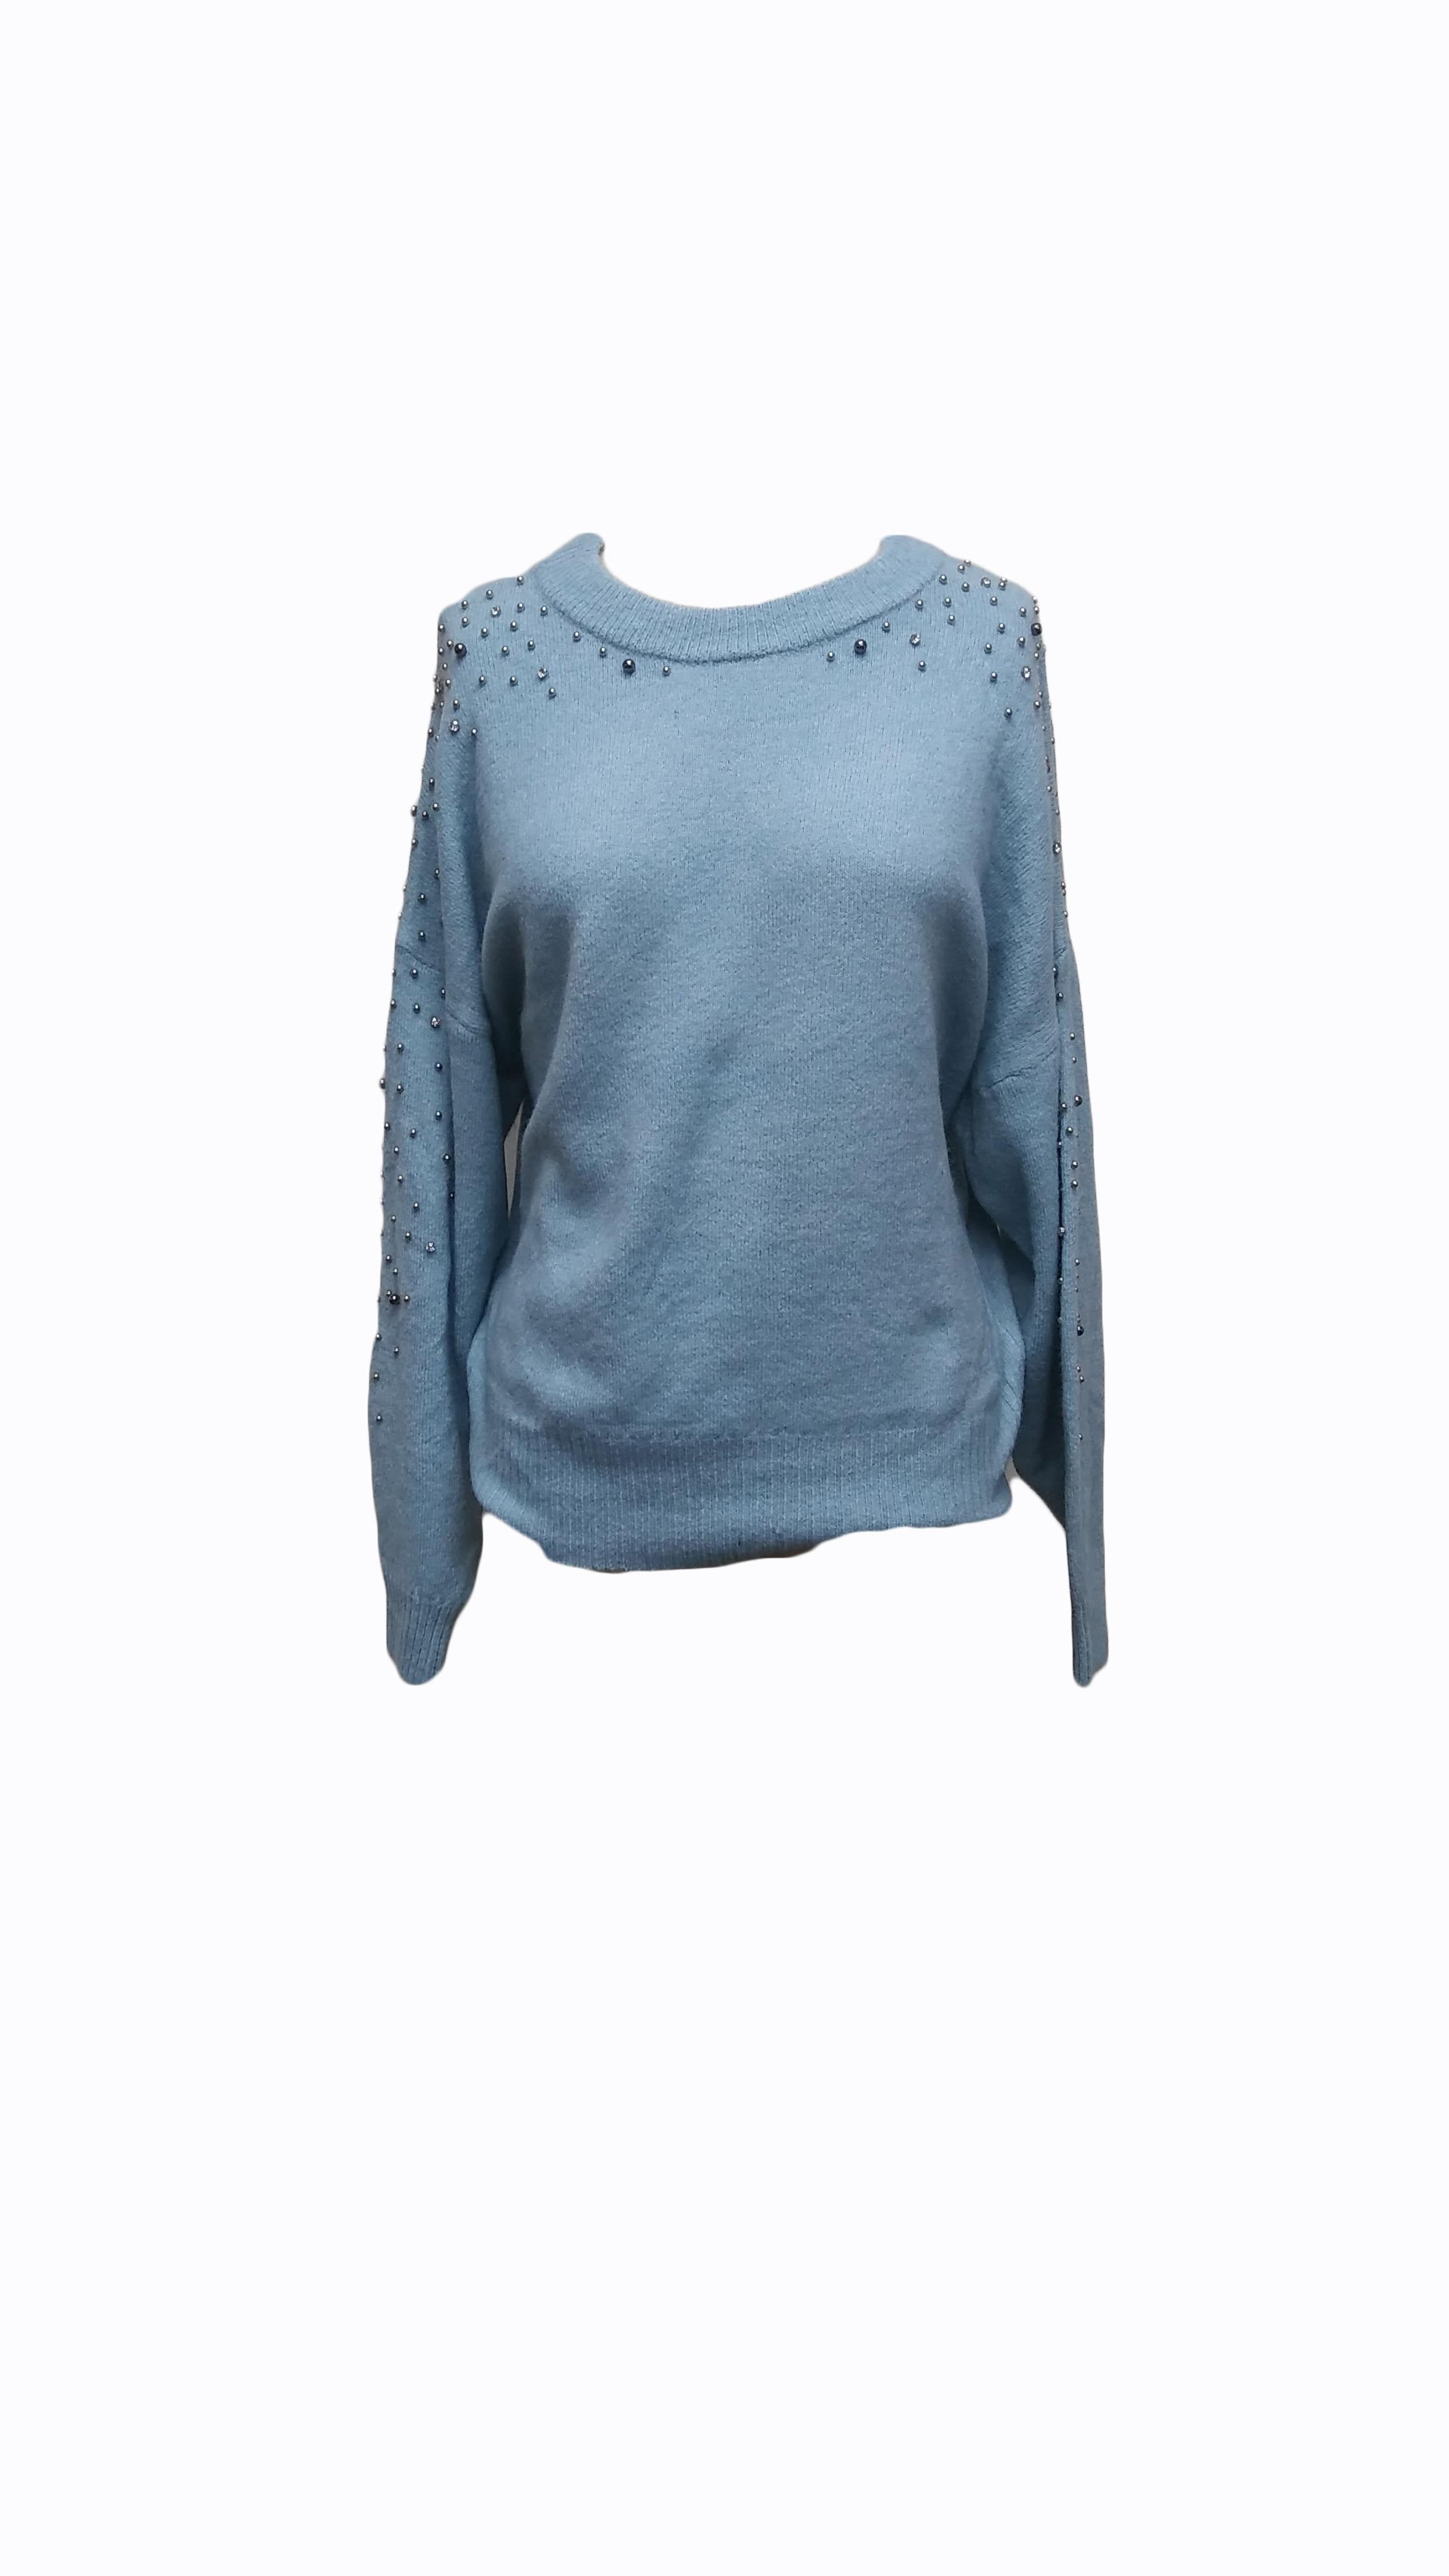 Sofi Studs Top - Blue - Front